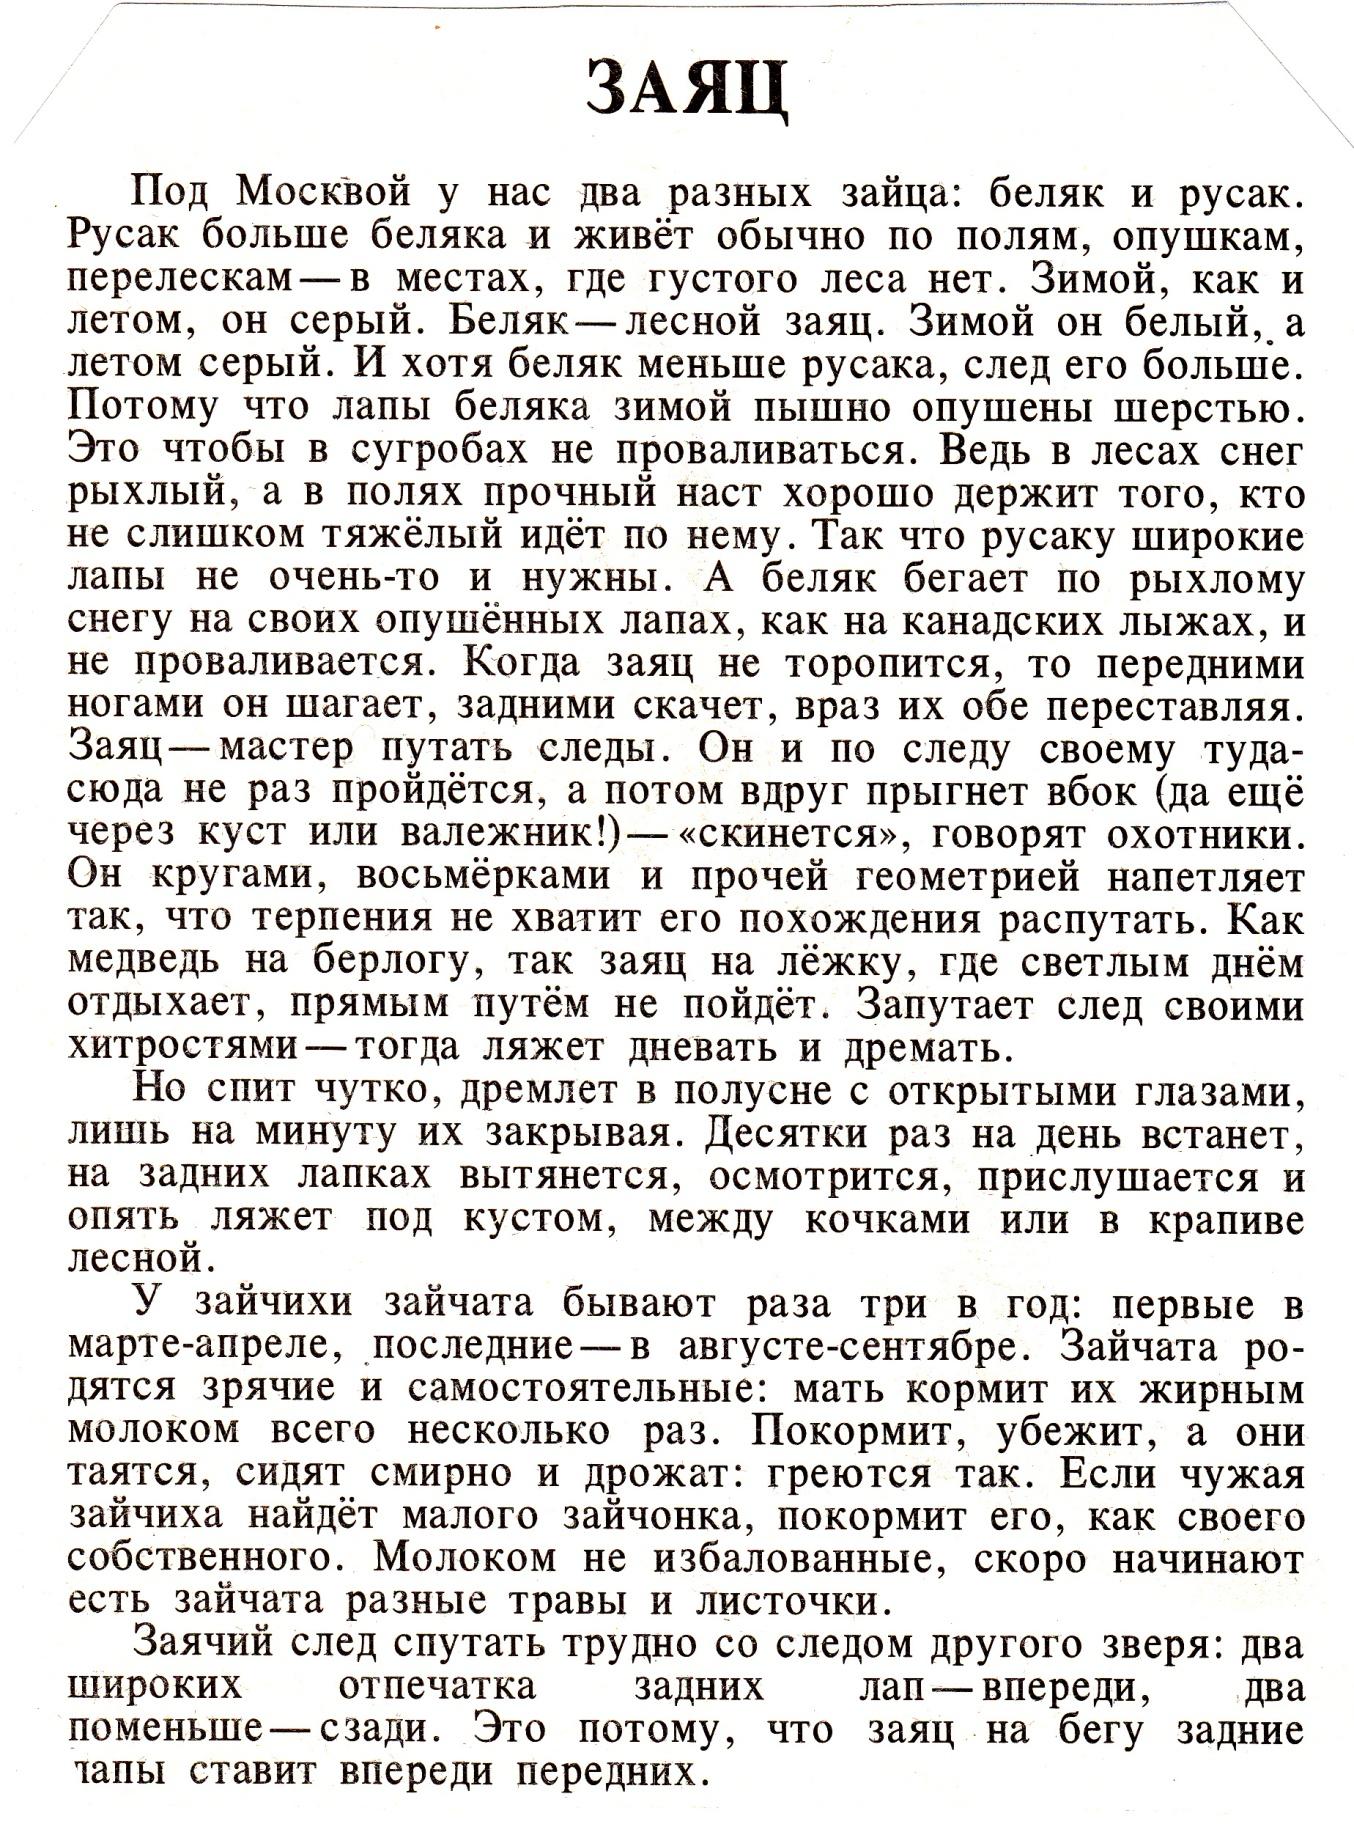 C:\Documents and Settings\User\Рабочий стол\IMG_0003.jpg